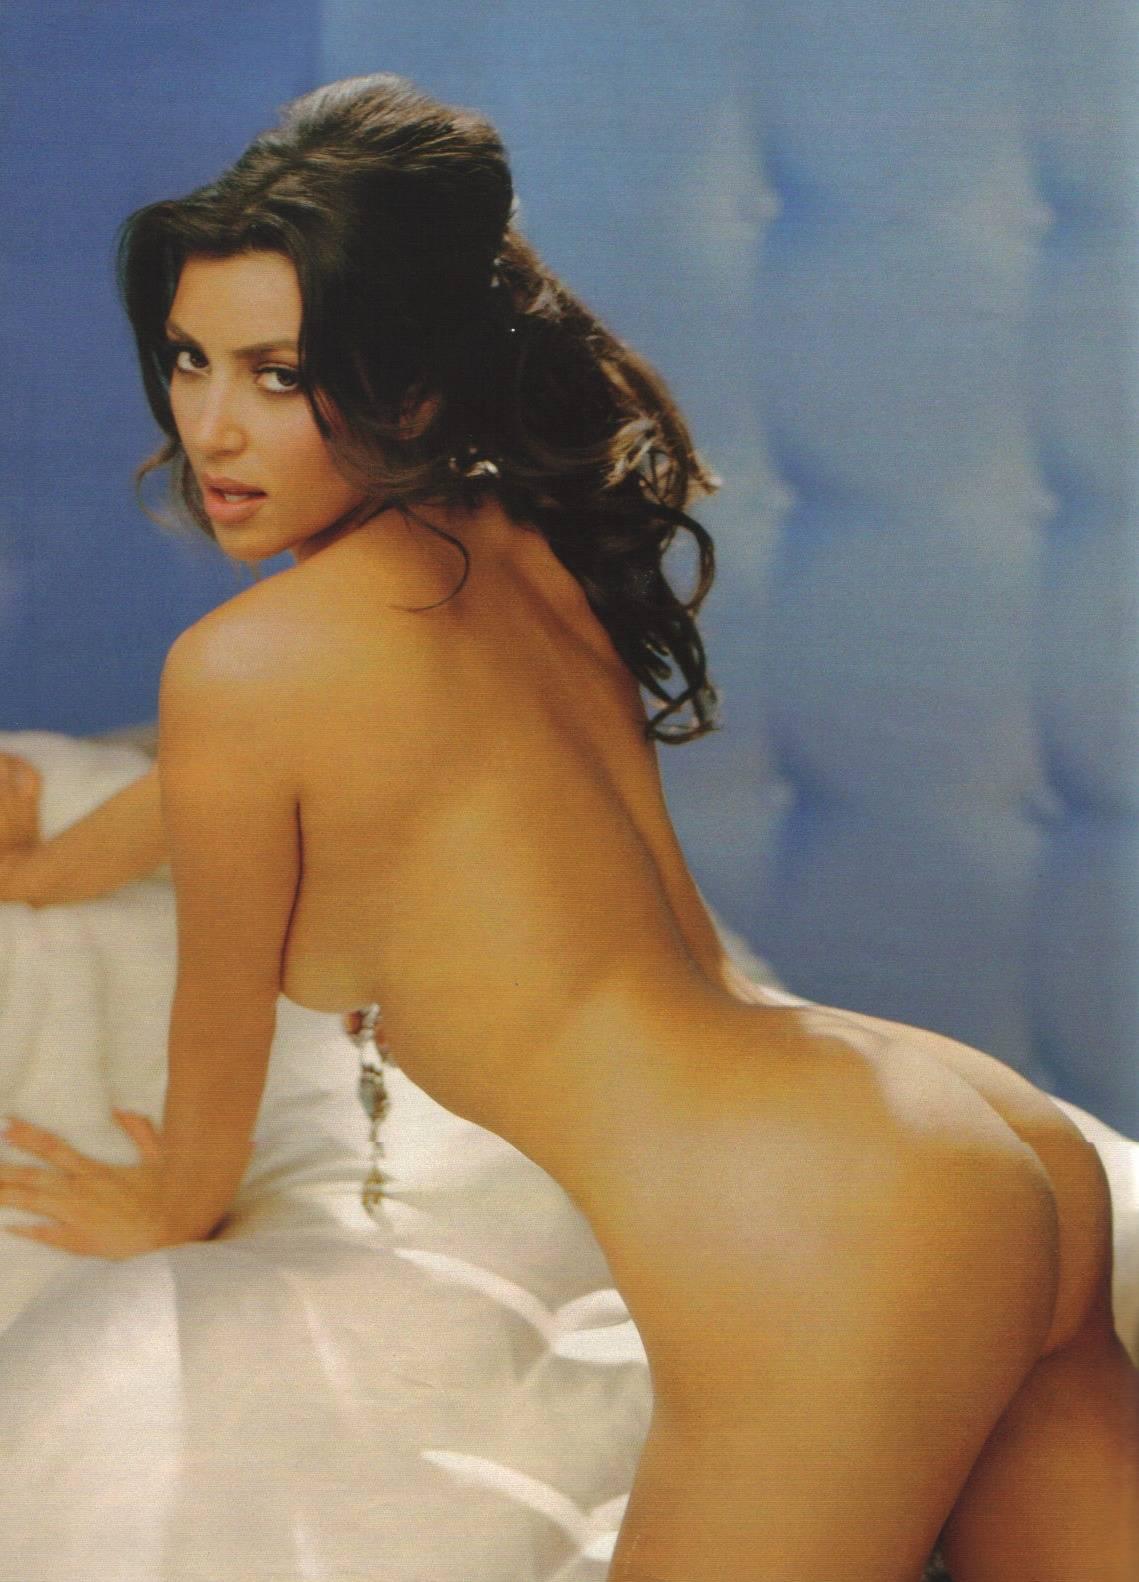 Hot nude pictures of kim kardashian